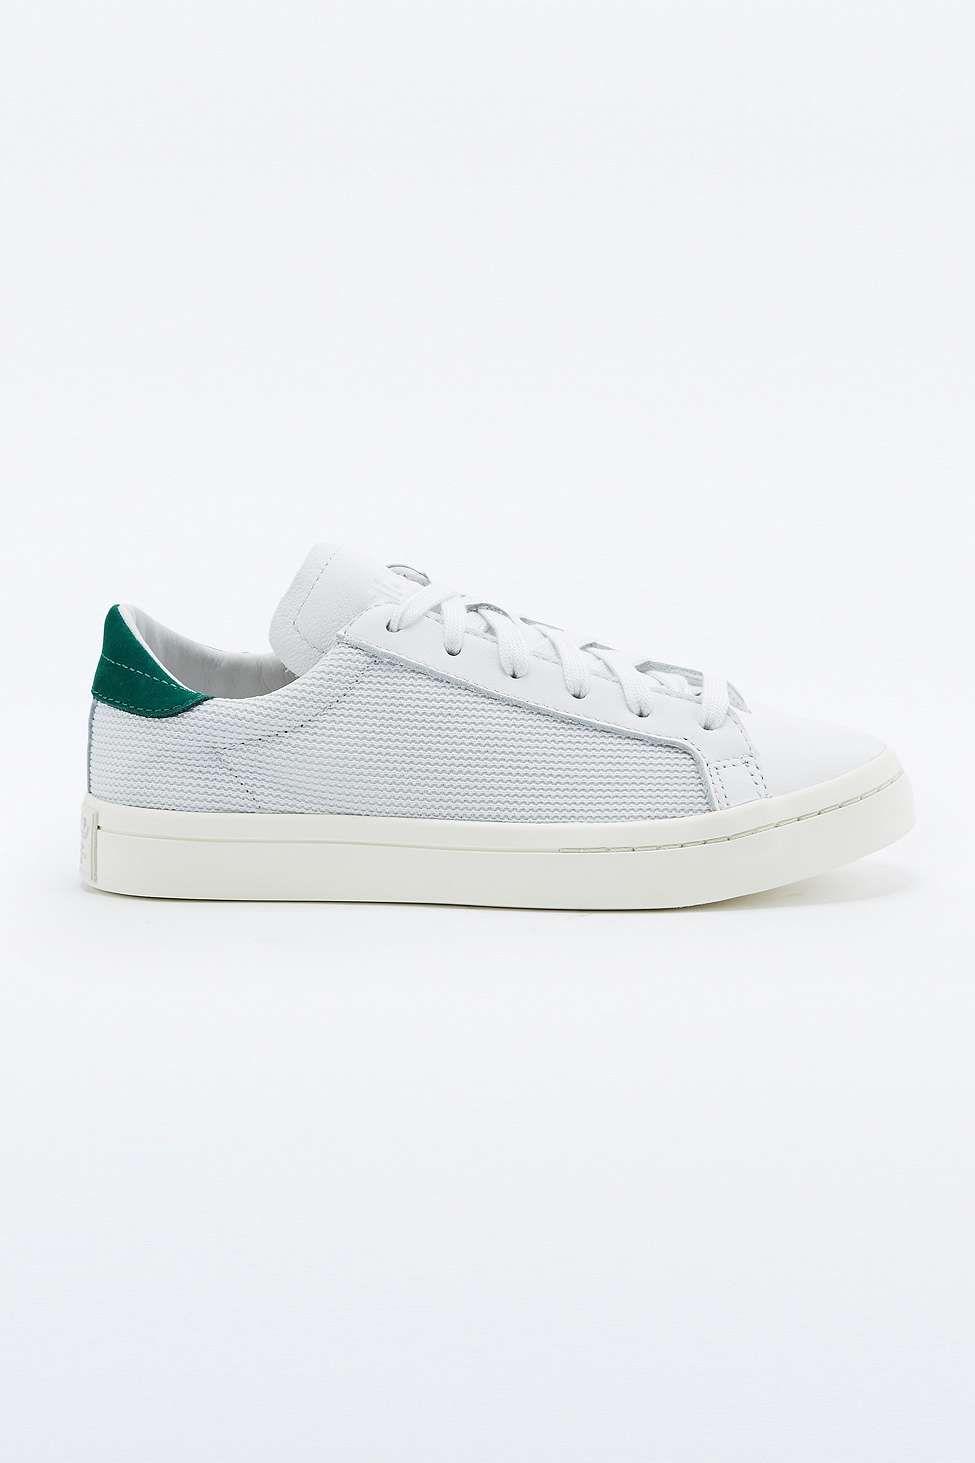 4632c55ac72564 adidas Originals Court Vantage White and Green Nubuck Trainers ...